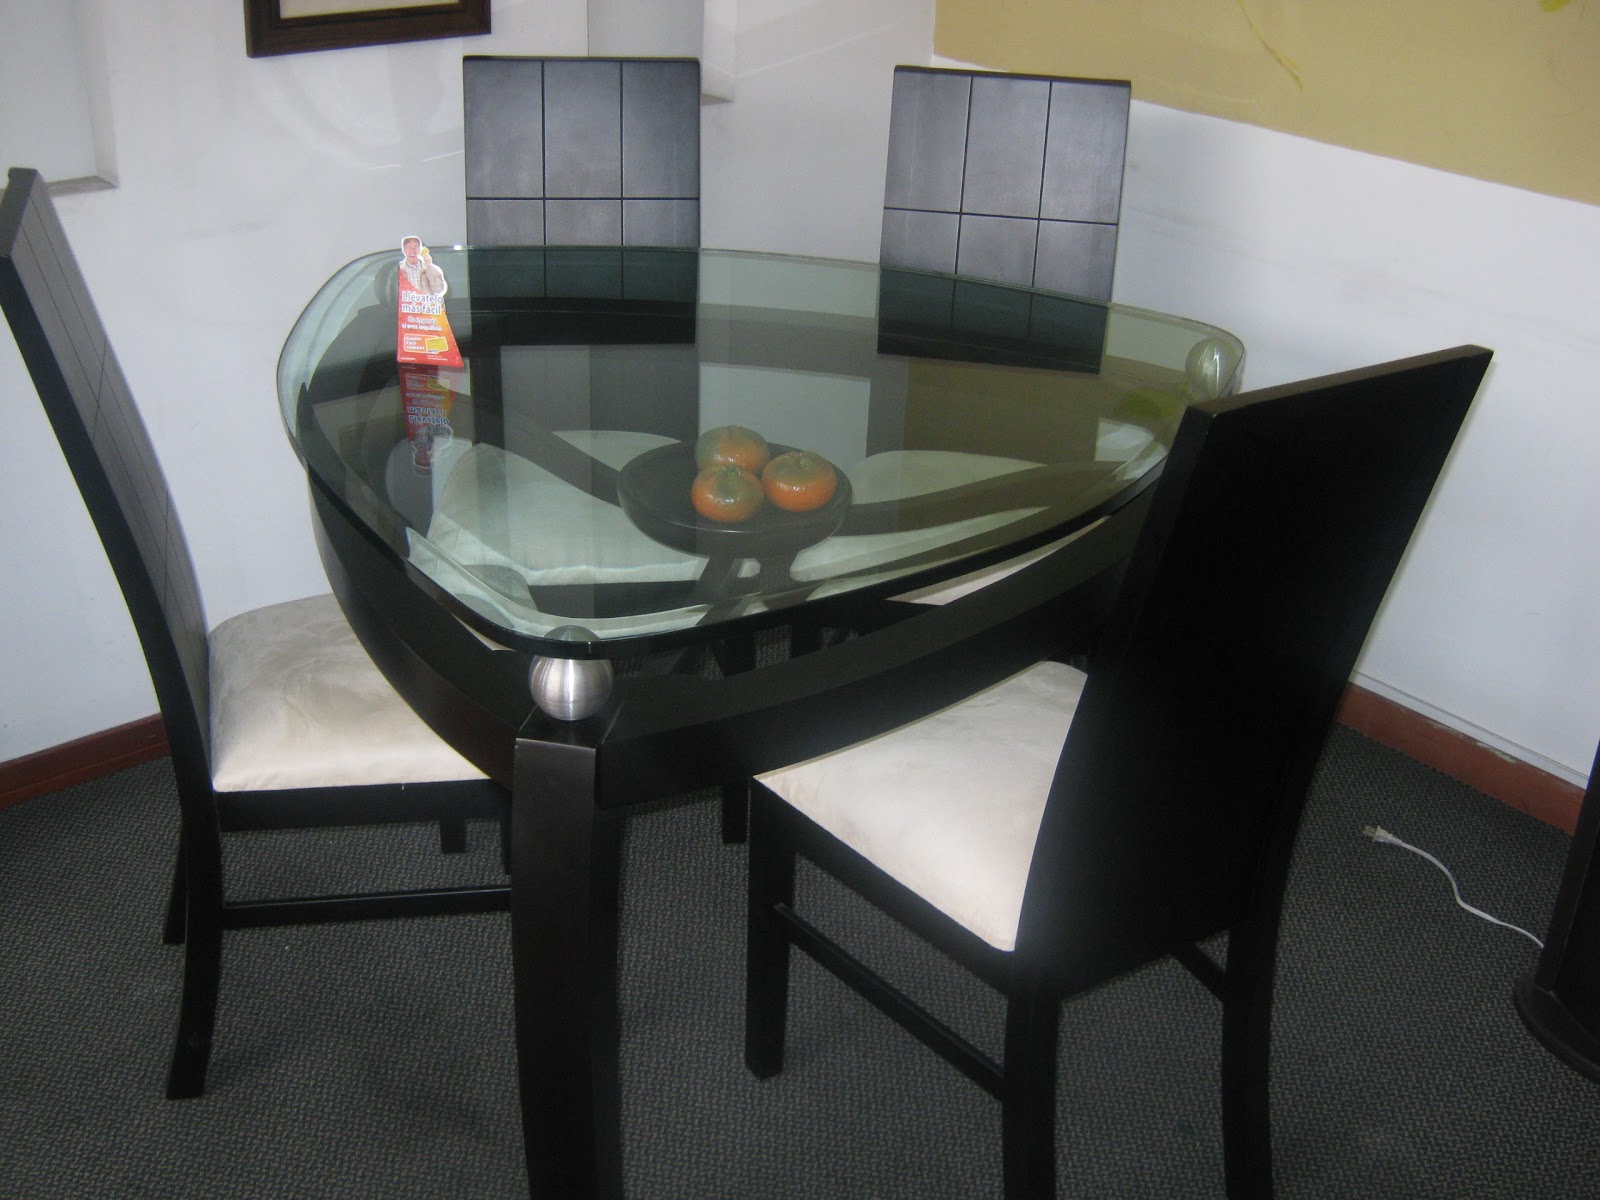 almacen outlet artek muebles y accesorios